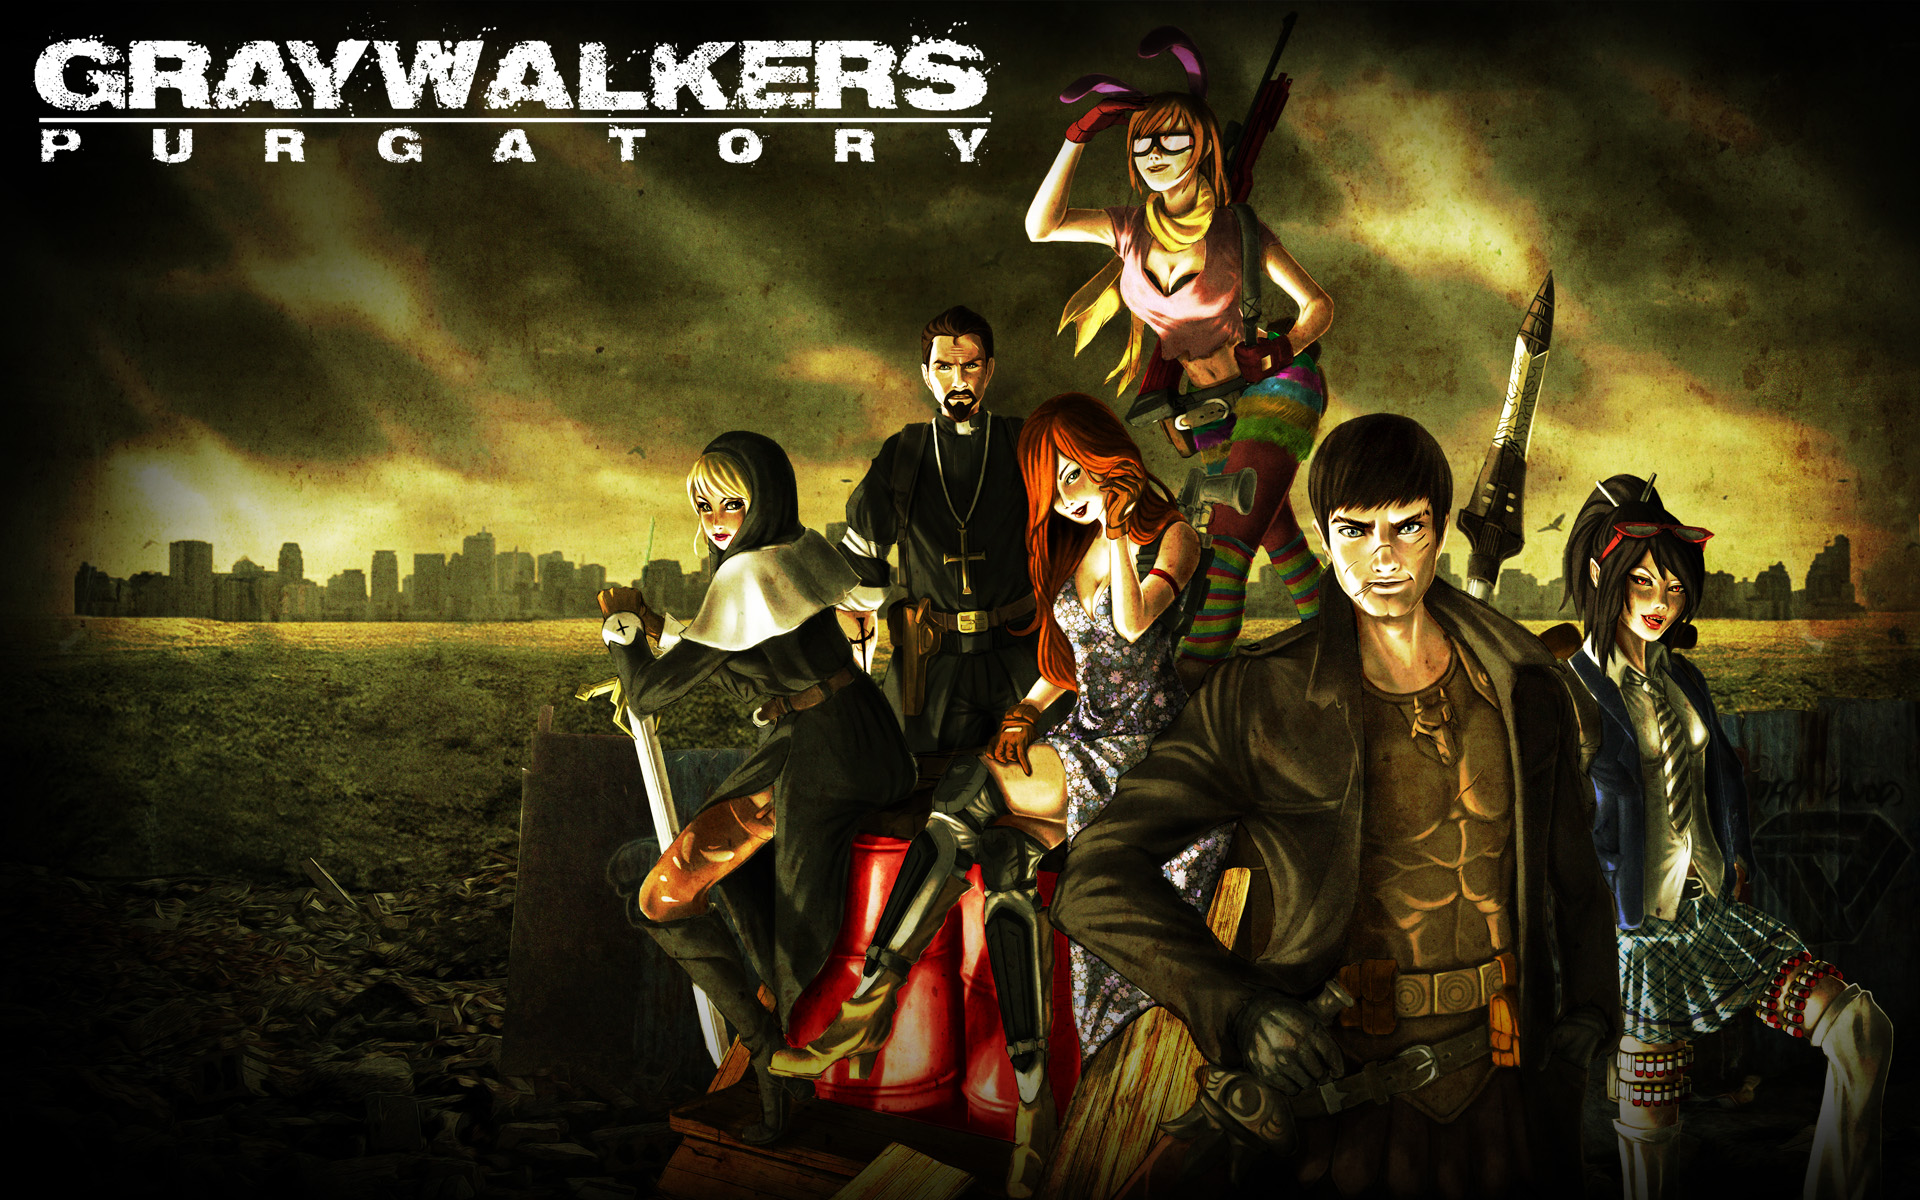 graywalkers wallpaper 1